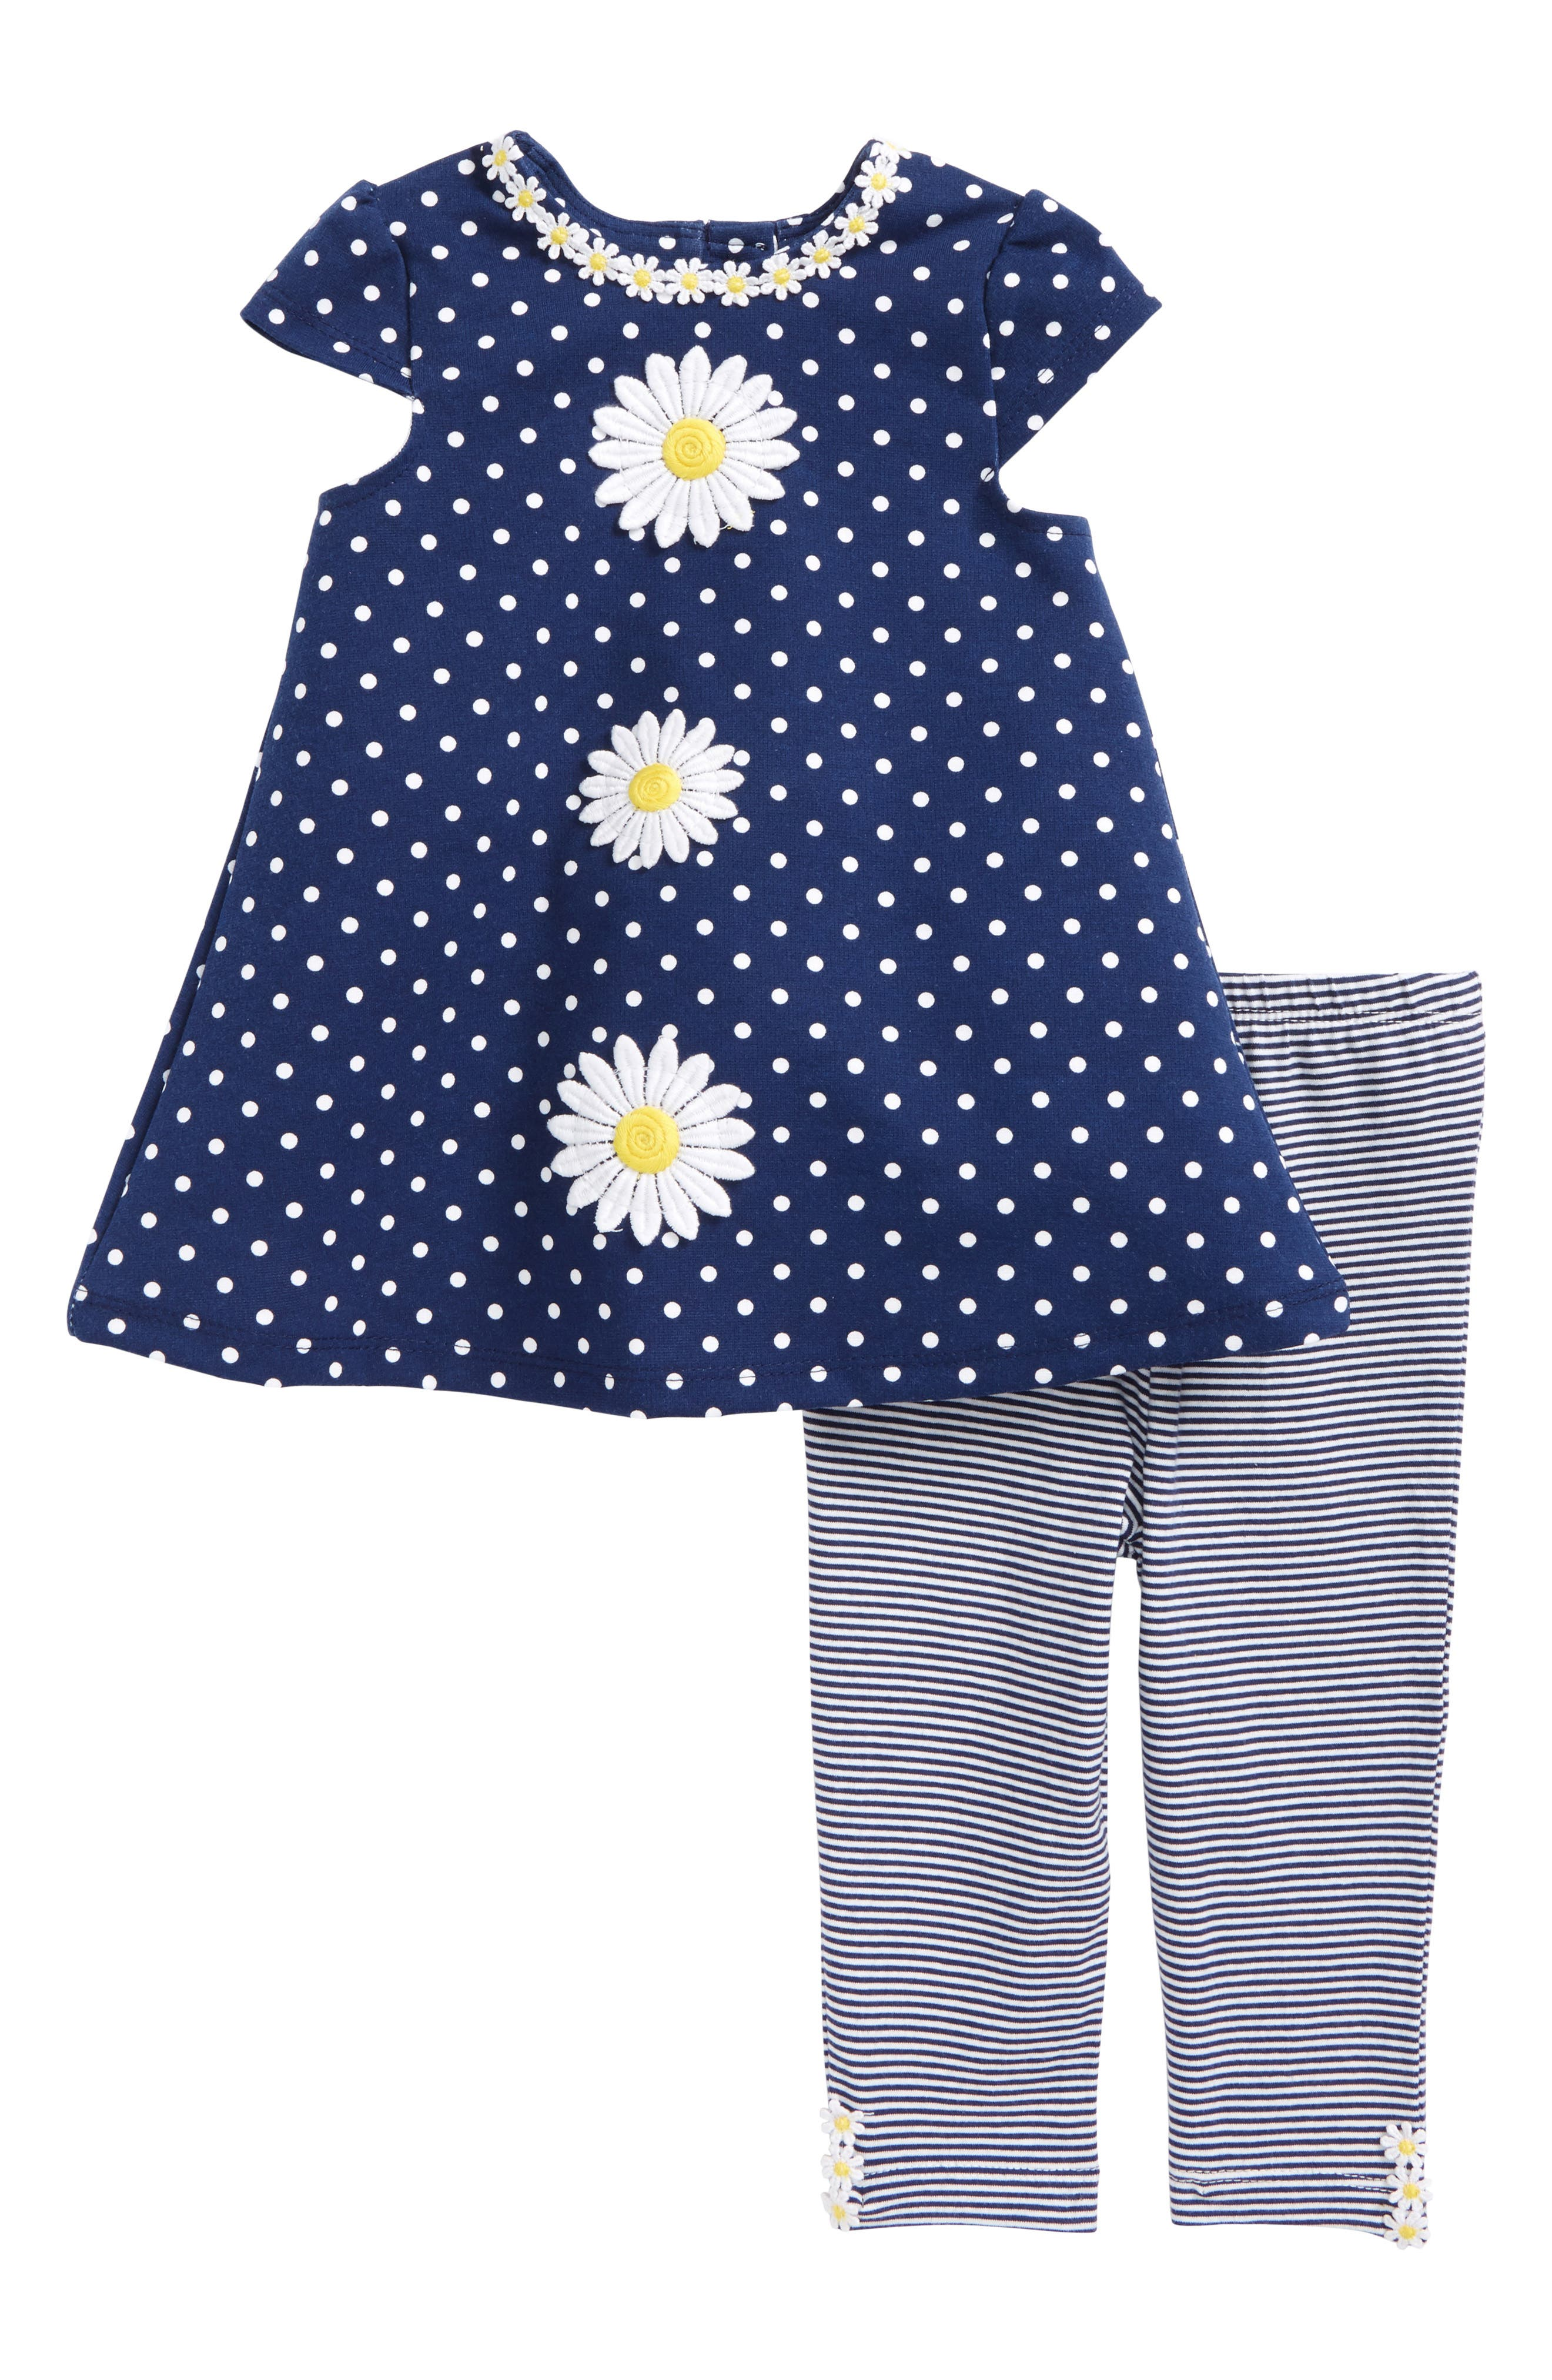 Daisy Polka Dot Dress & Stripe Leggings Set,                             Main thumbnail 1, color,